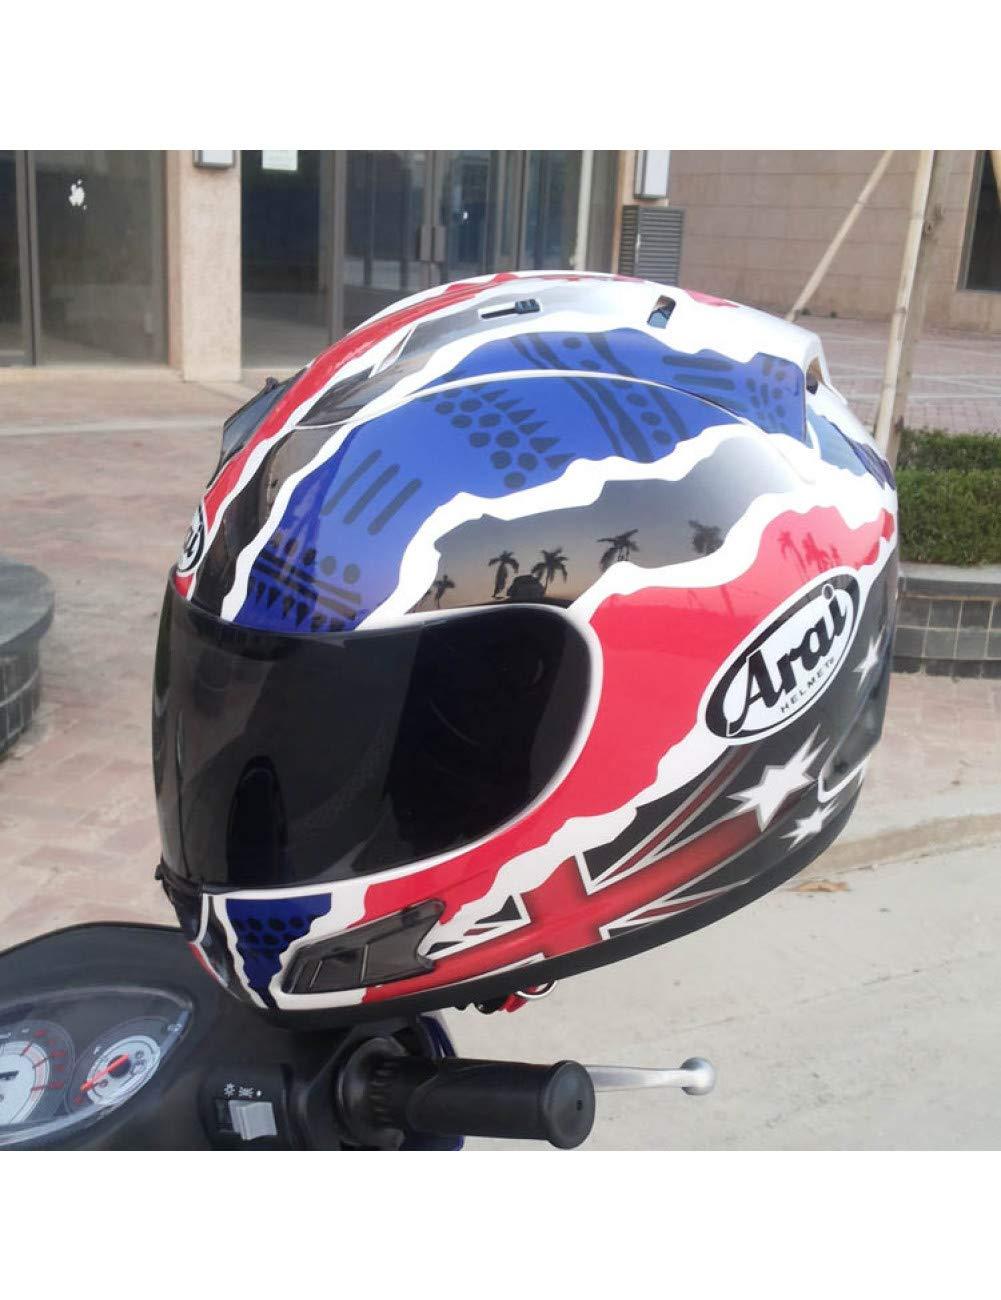 Casco De Moto Capacete//Unisex LJPHFF Casco De Moto Casco Completo Casco Arai Casco De Moto Integral Ece Azul